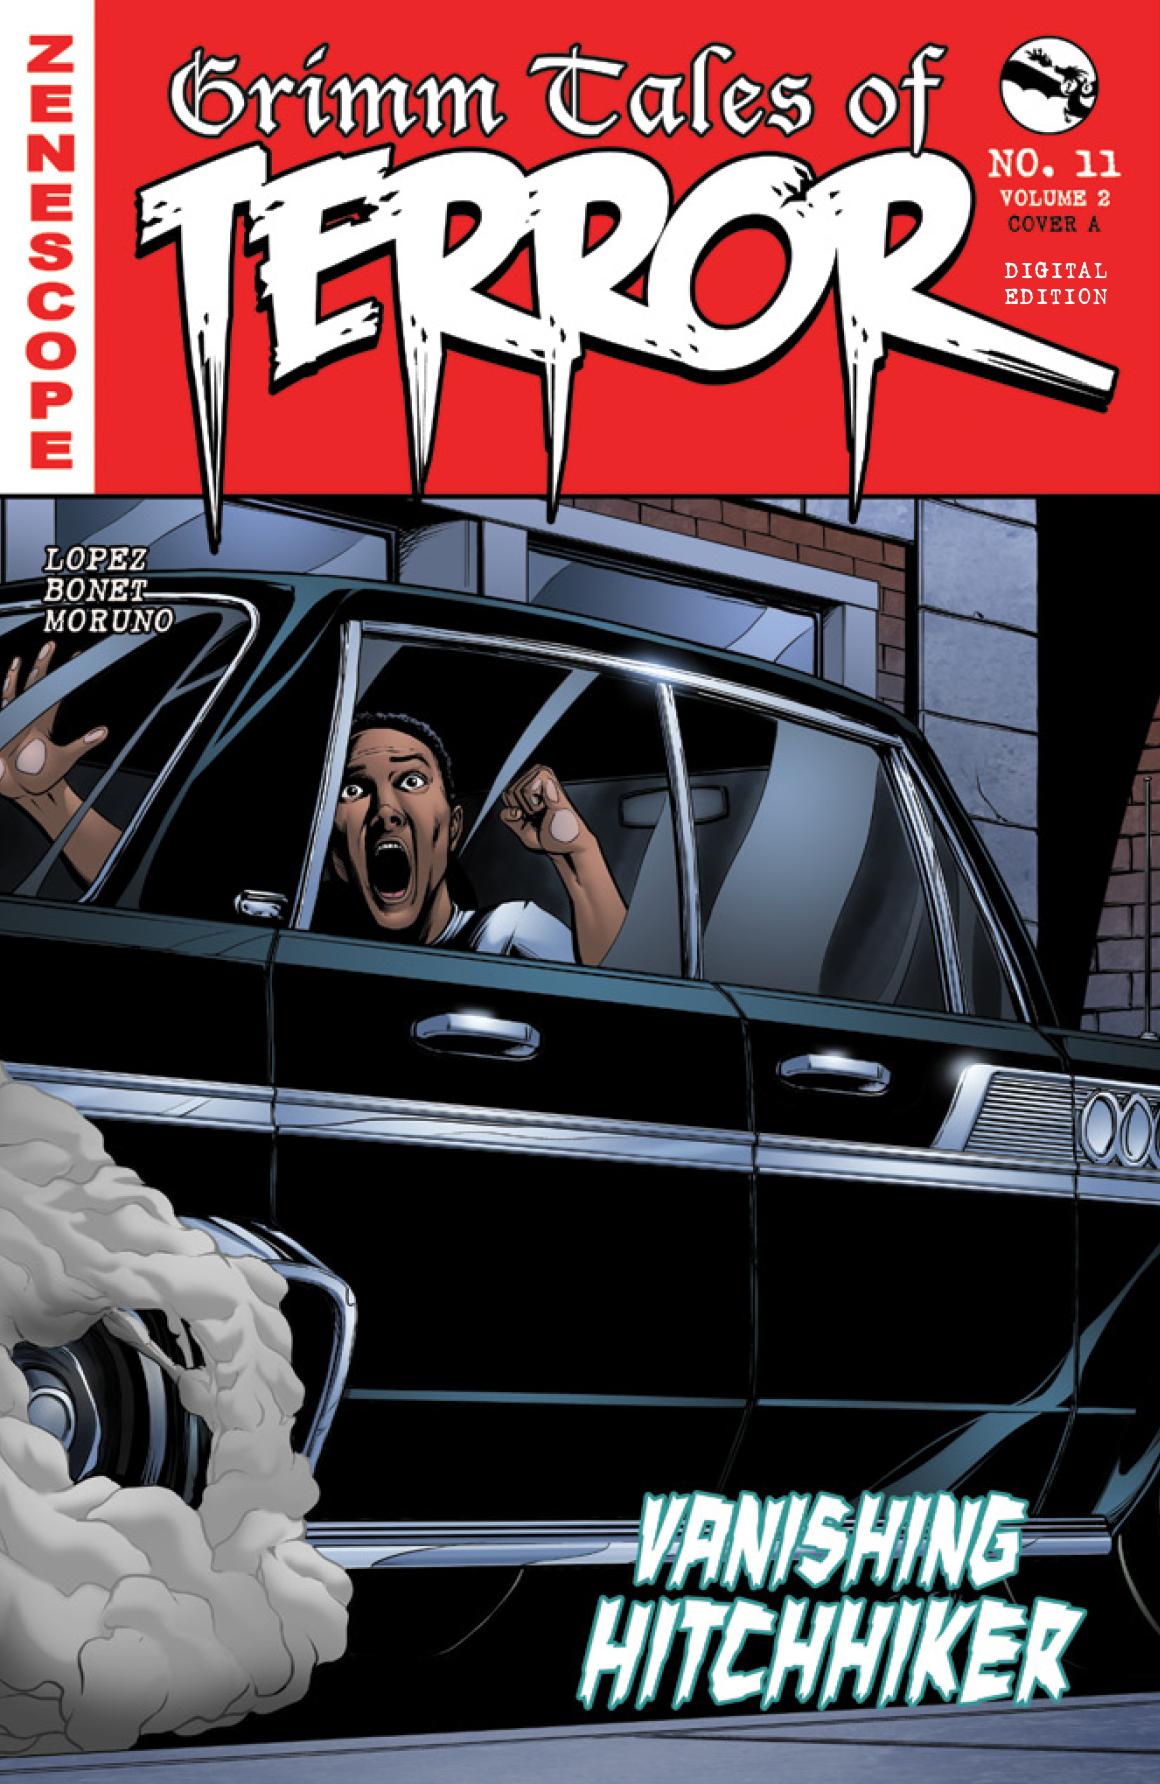 Review: Grimm Tales of Terror vol  2 #11 — Comic Bastards